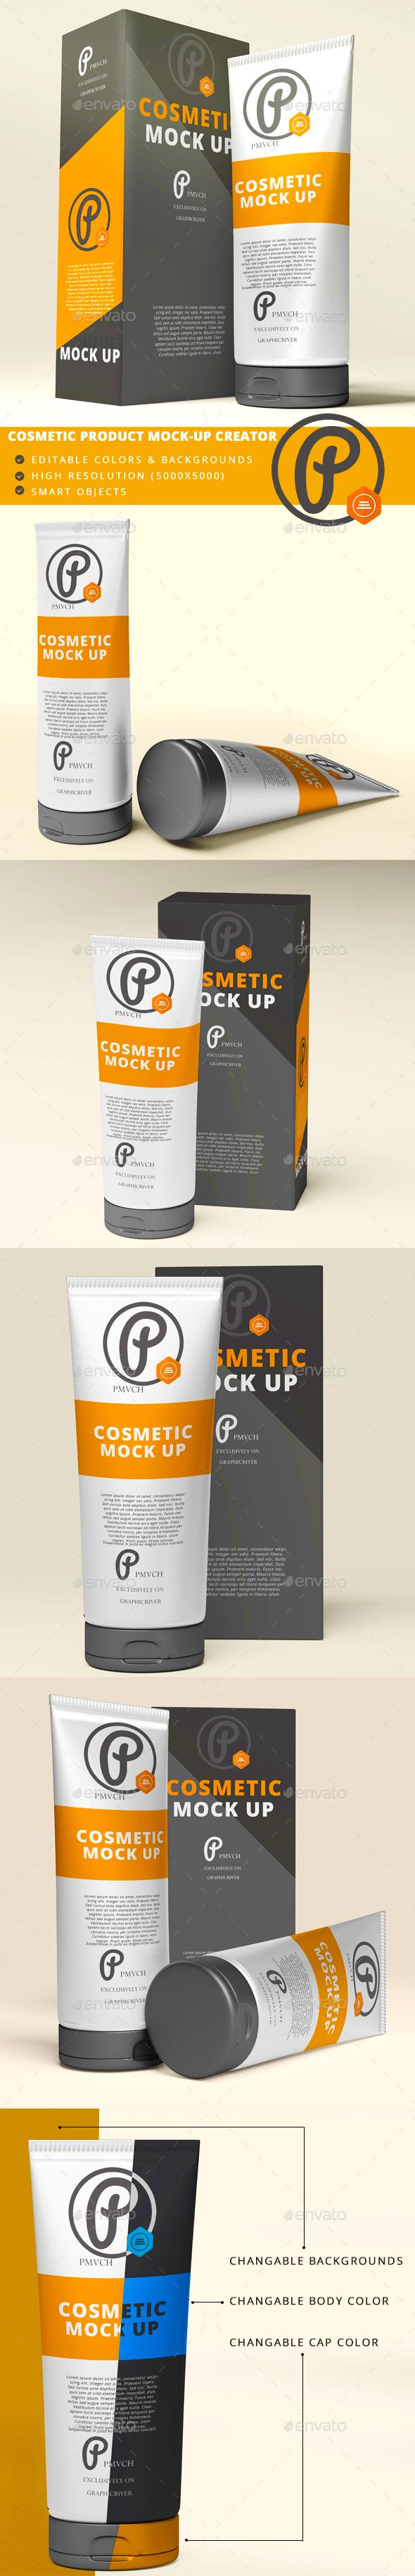 Cream Tubes Mock Up Kit - Beauty Packaging